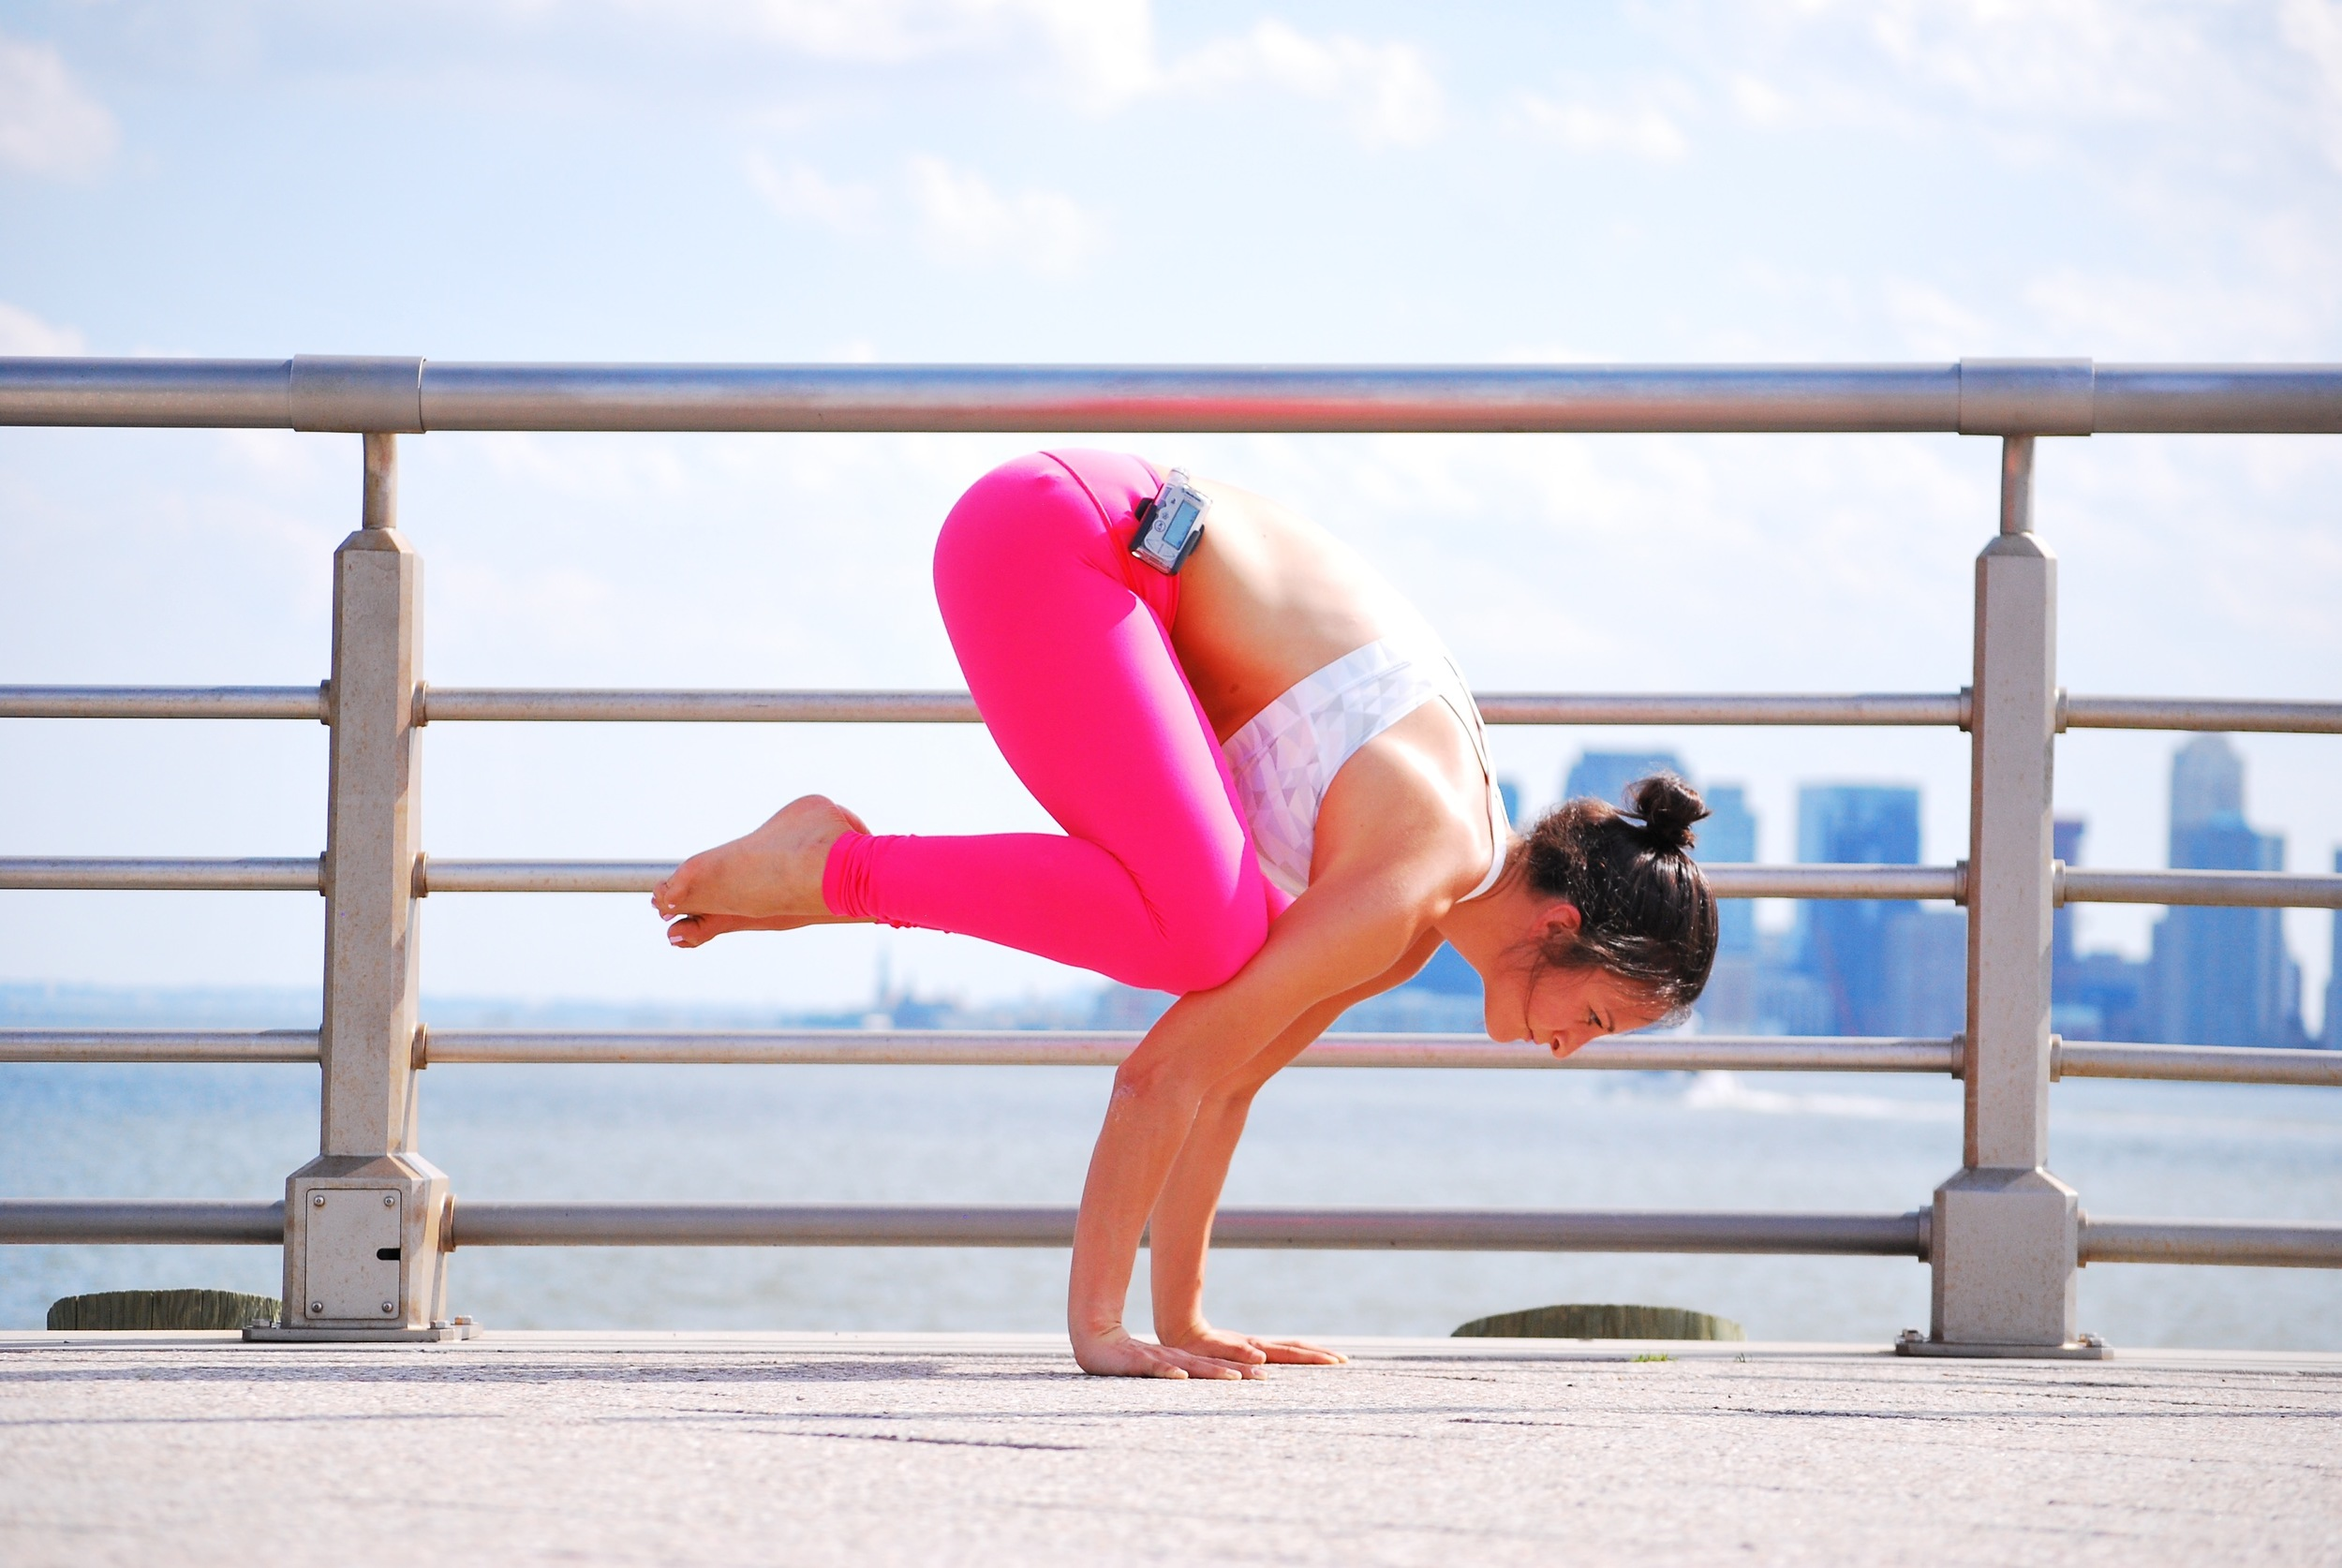 Lauren Bongiorno - Long Island, NY - Diabetic health coach & Yoga instructor